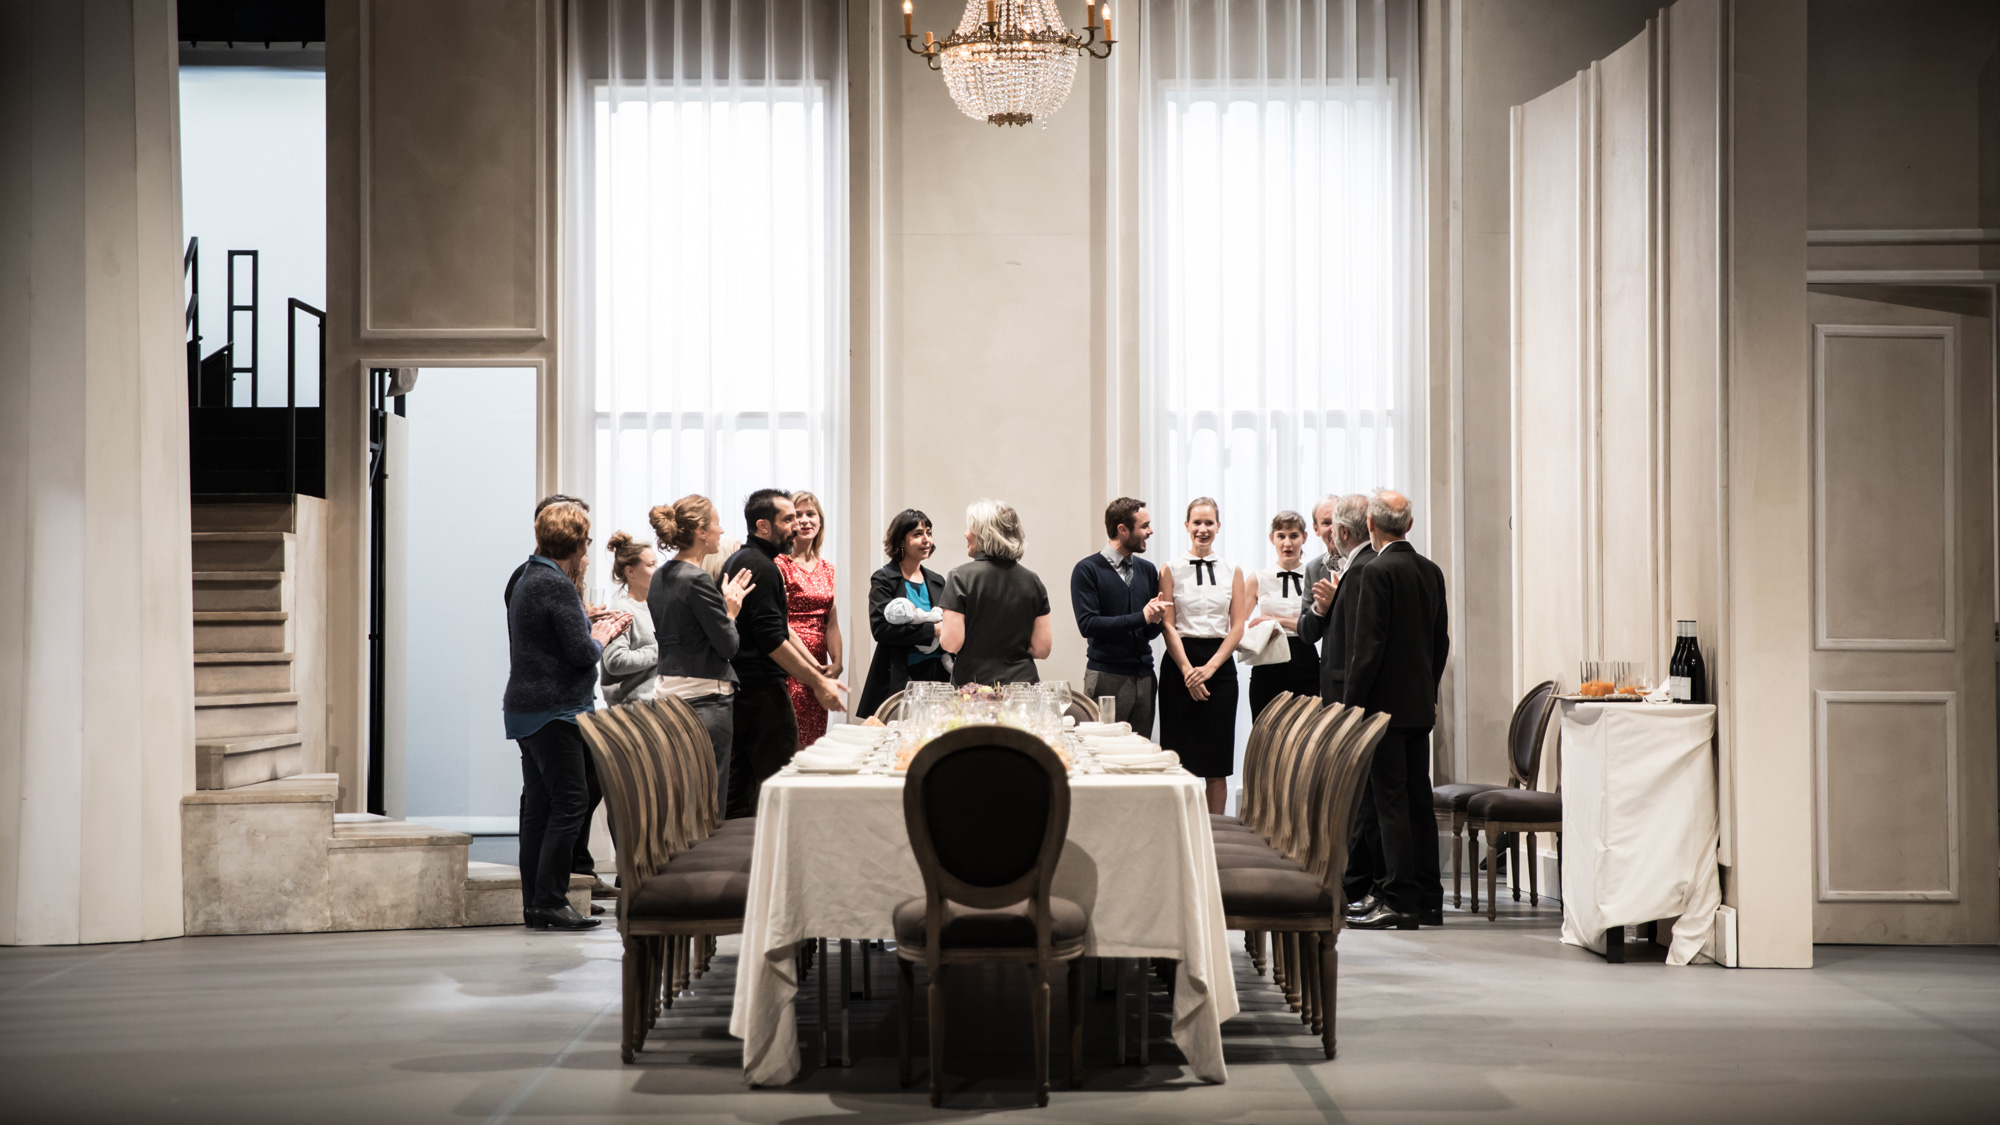 Festen / Thomas Vinterberg et Mogens Rukov / Cyril Teste / Collectif MxM